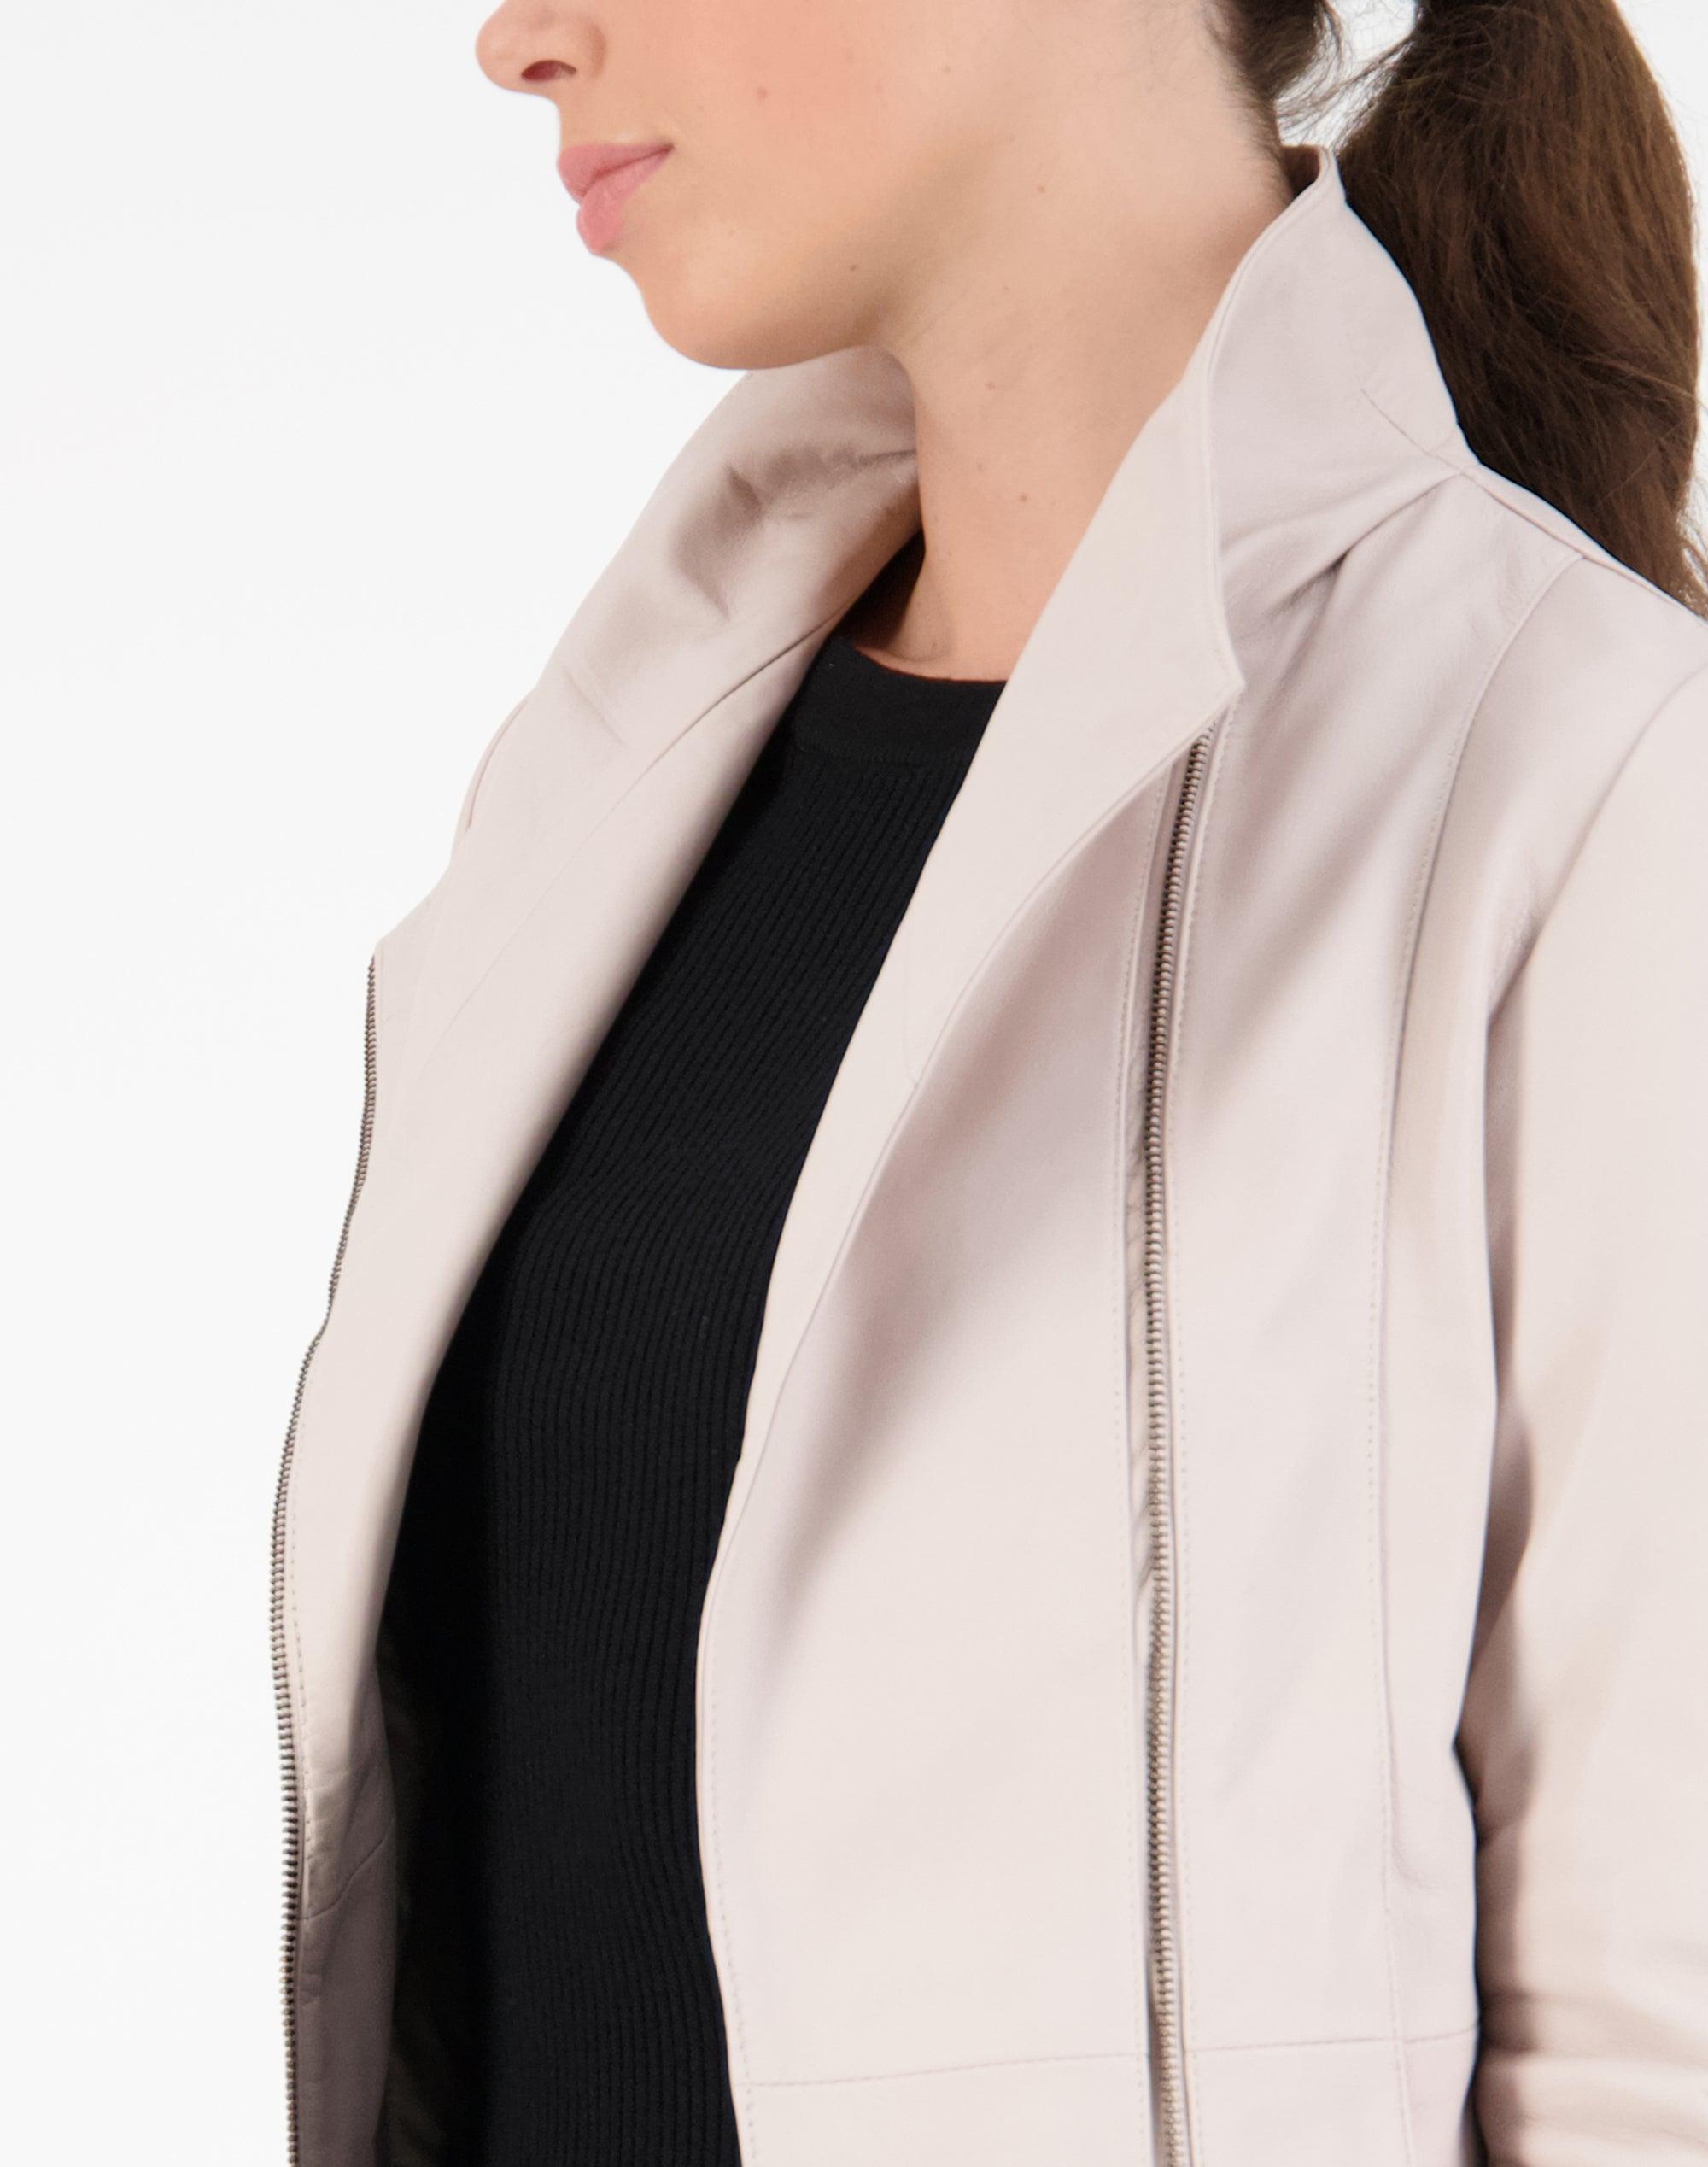 Krave Leather Jacket